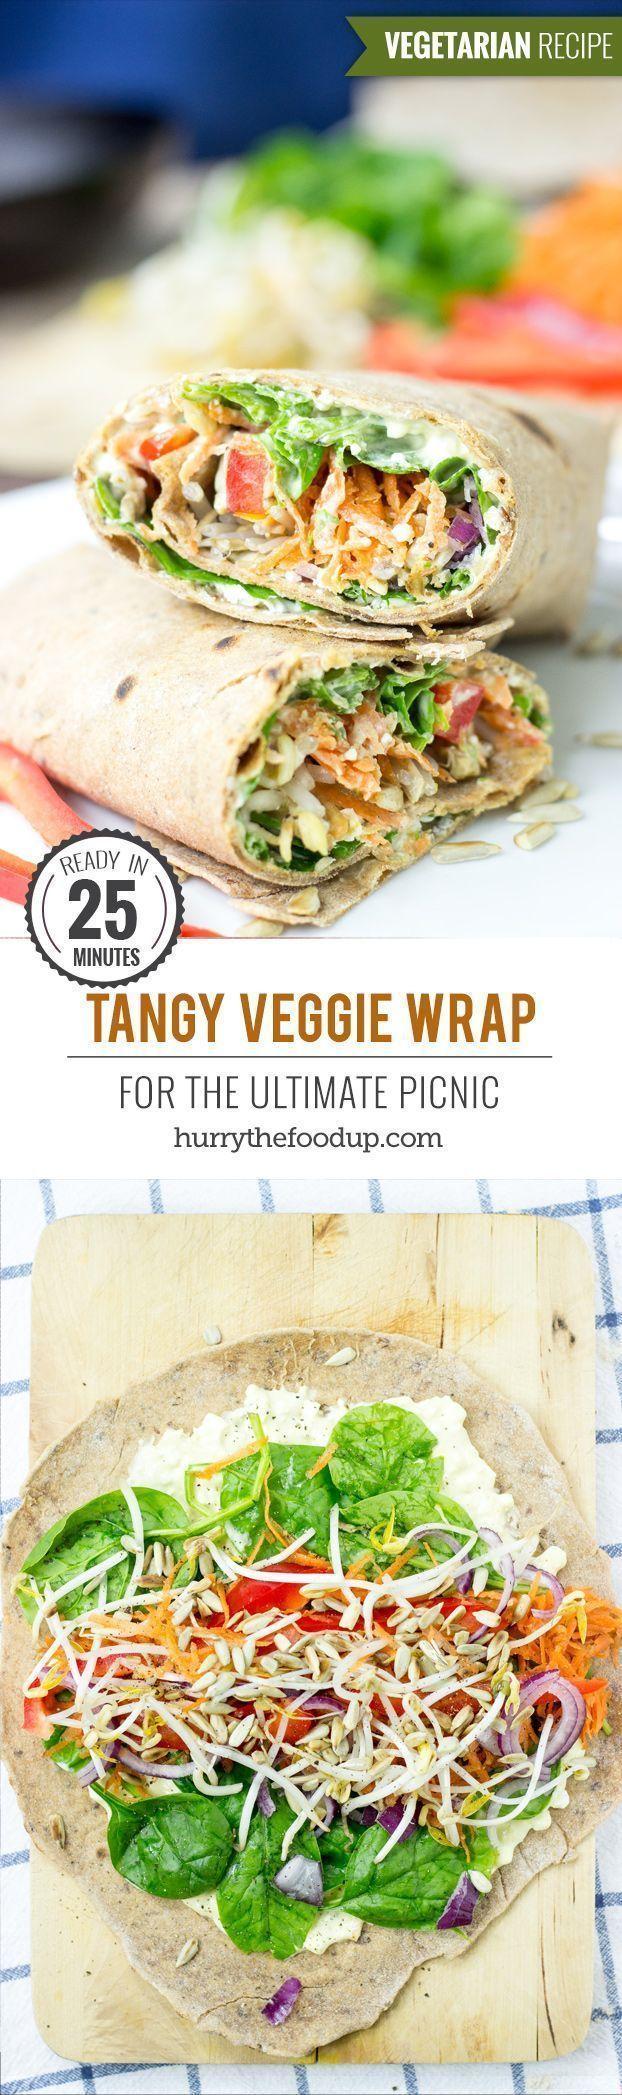 how to make a veggie wrap sandwich